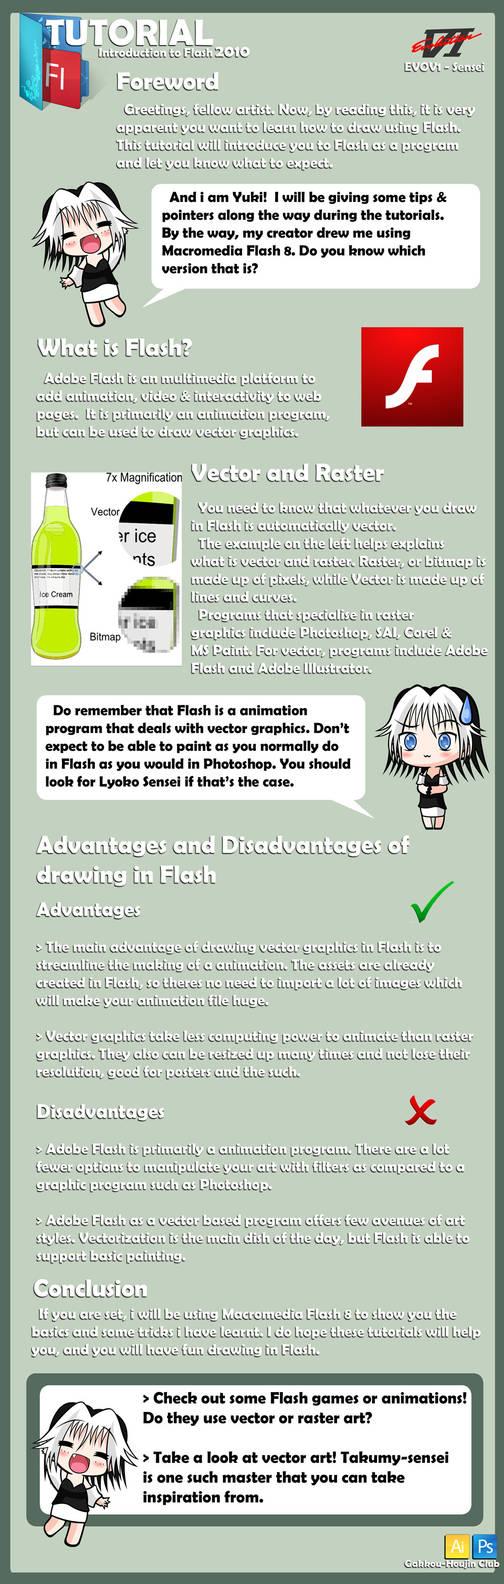 Flash Tutorial Introduction by EVOV1 on DeviantArt